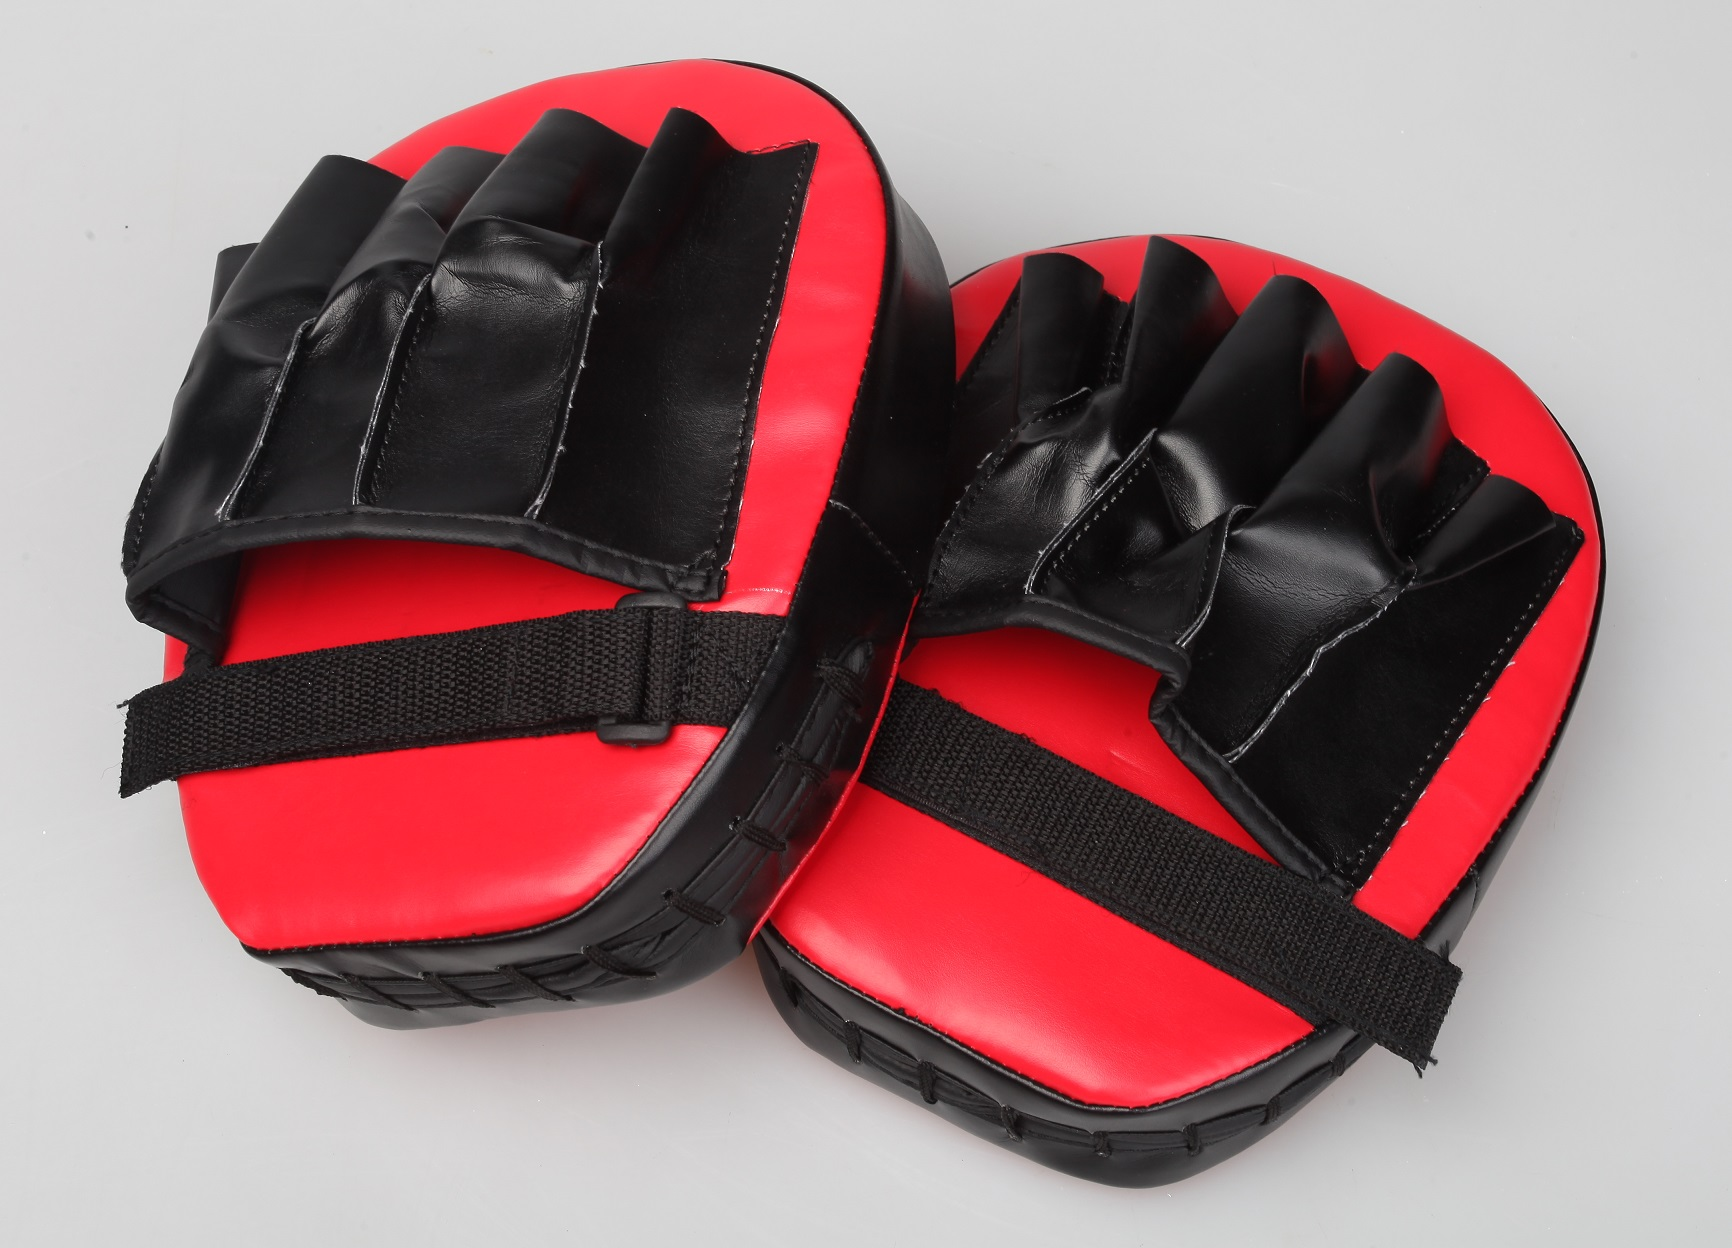 2 x Thai Boxing Punch Focus Gloves Kit Pad Mitt Karate Muay Training Red & Black  Z2560